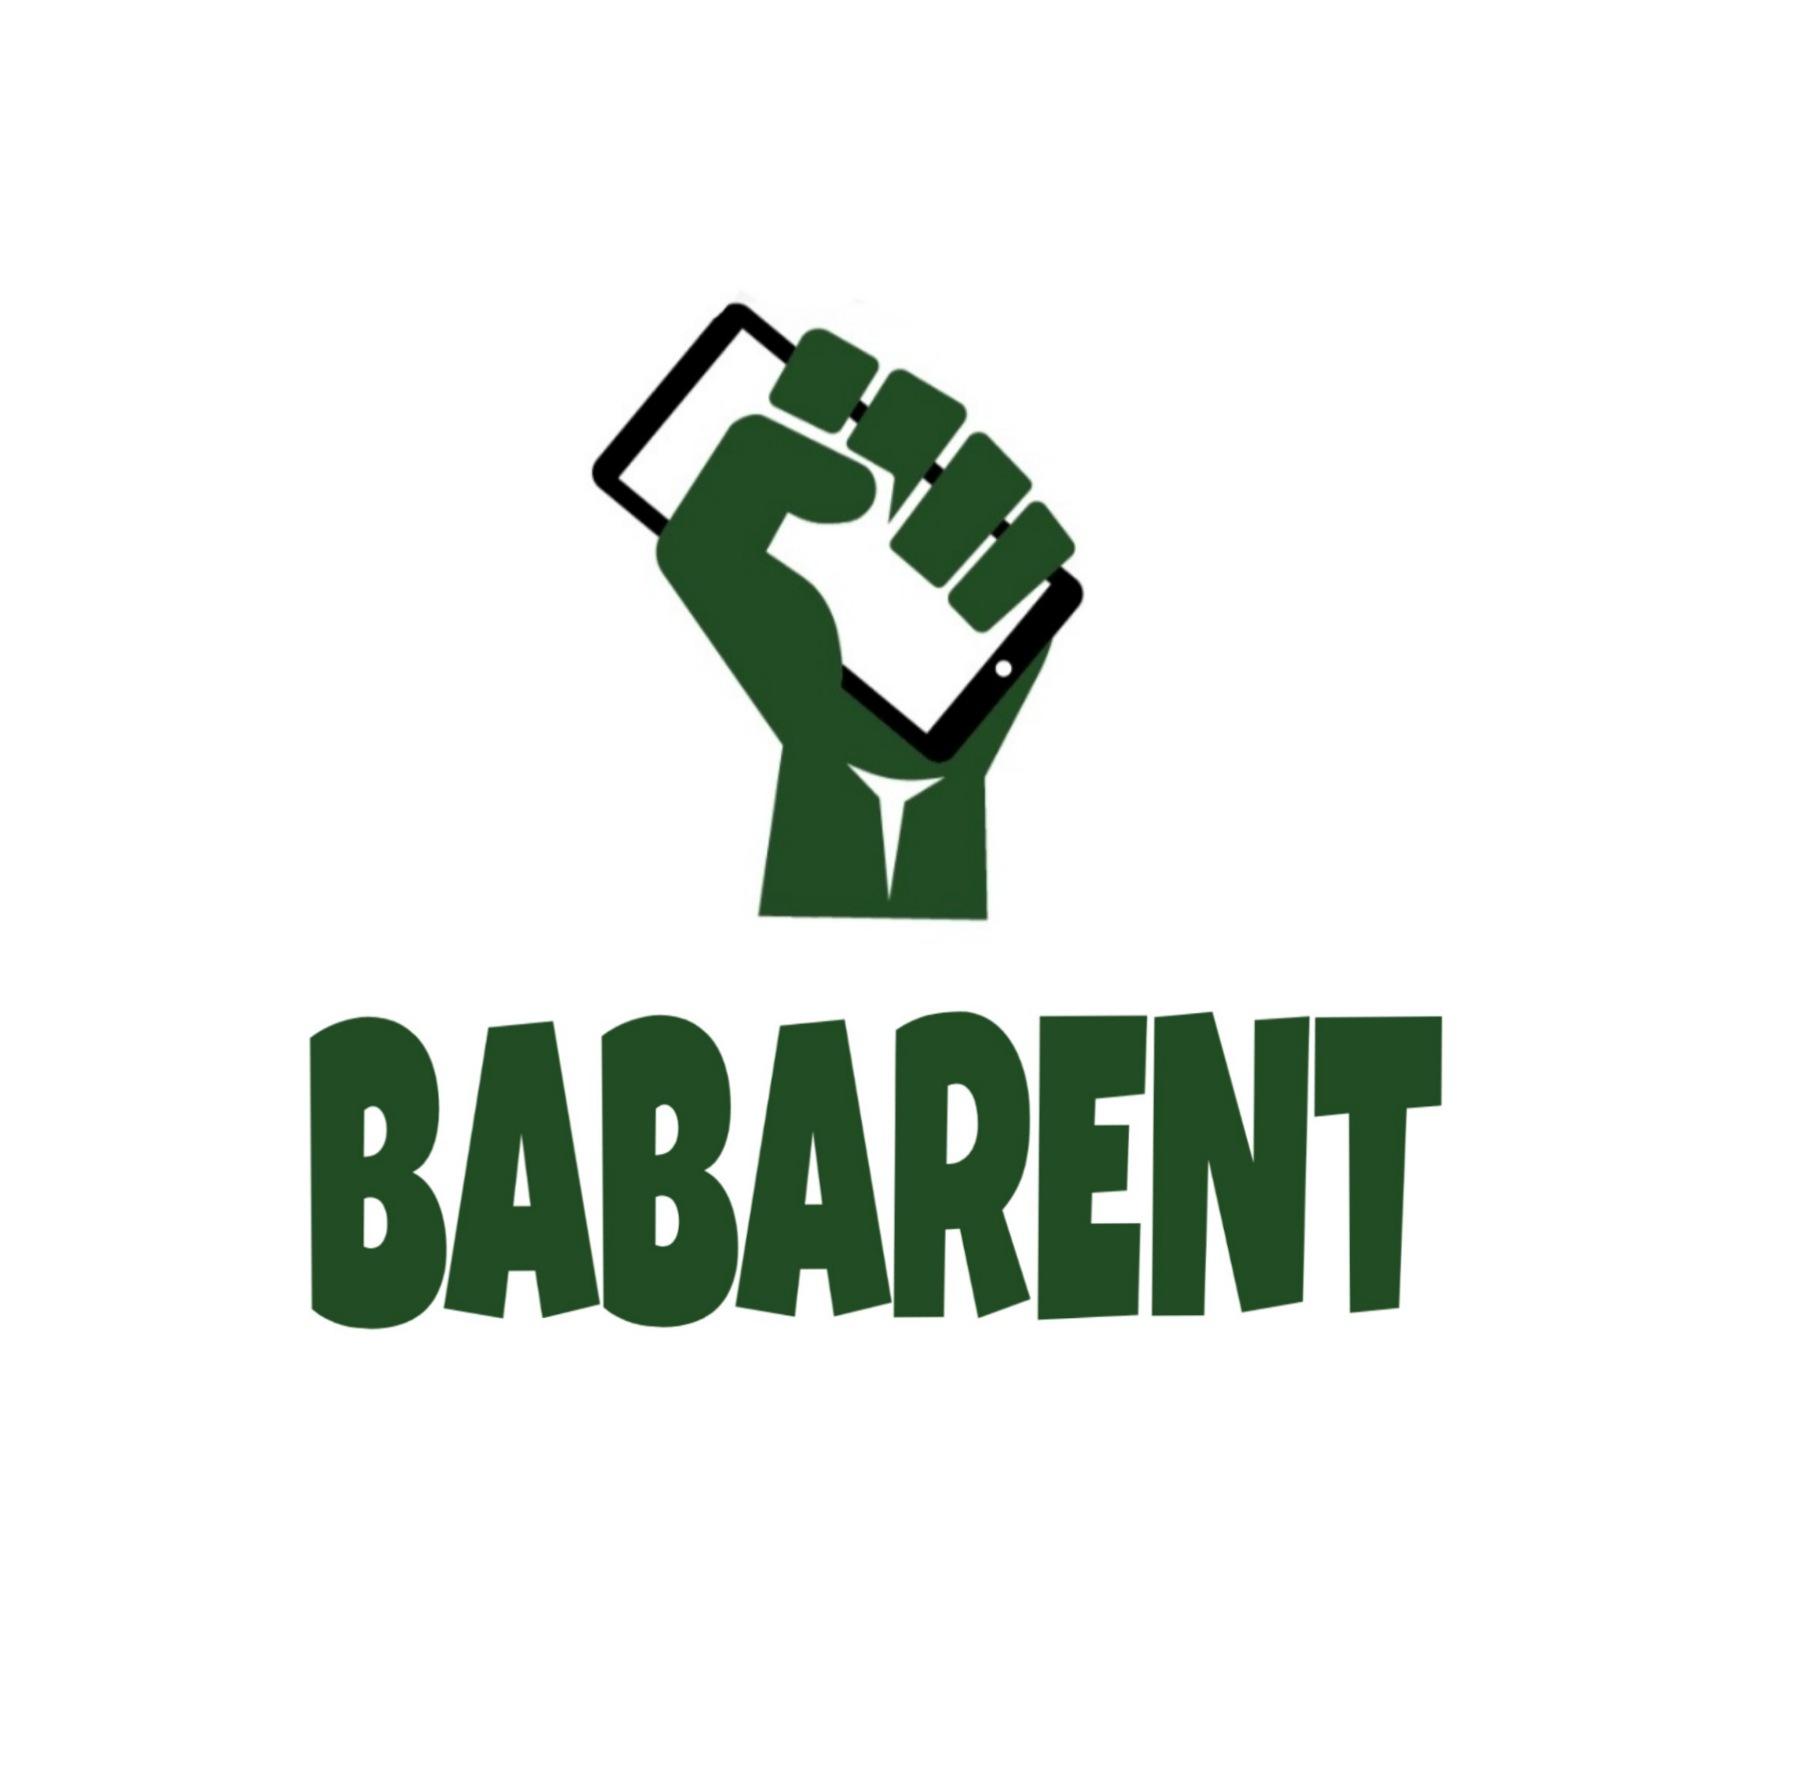 Babarent